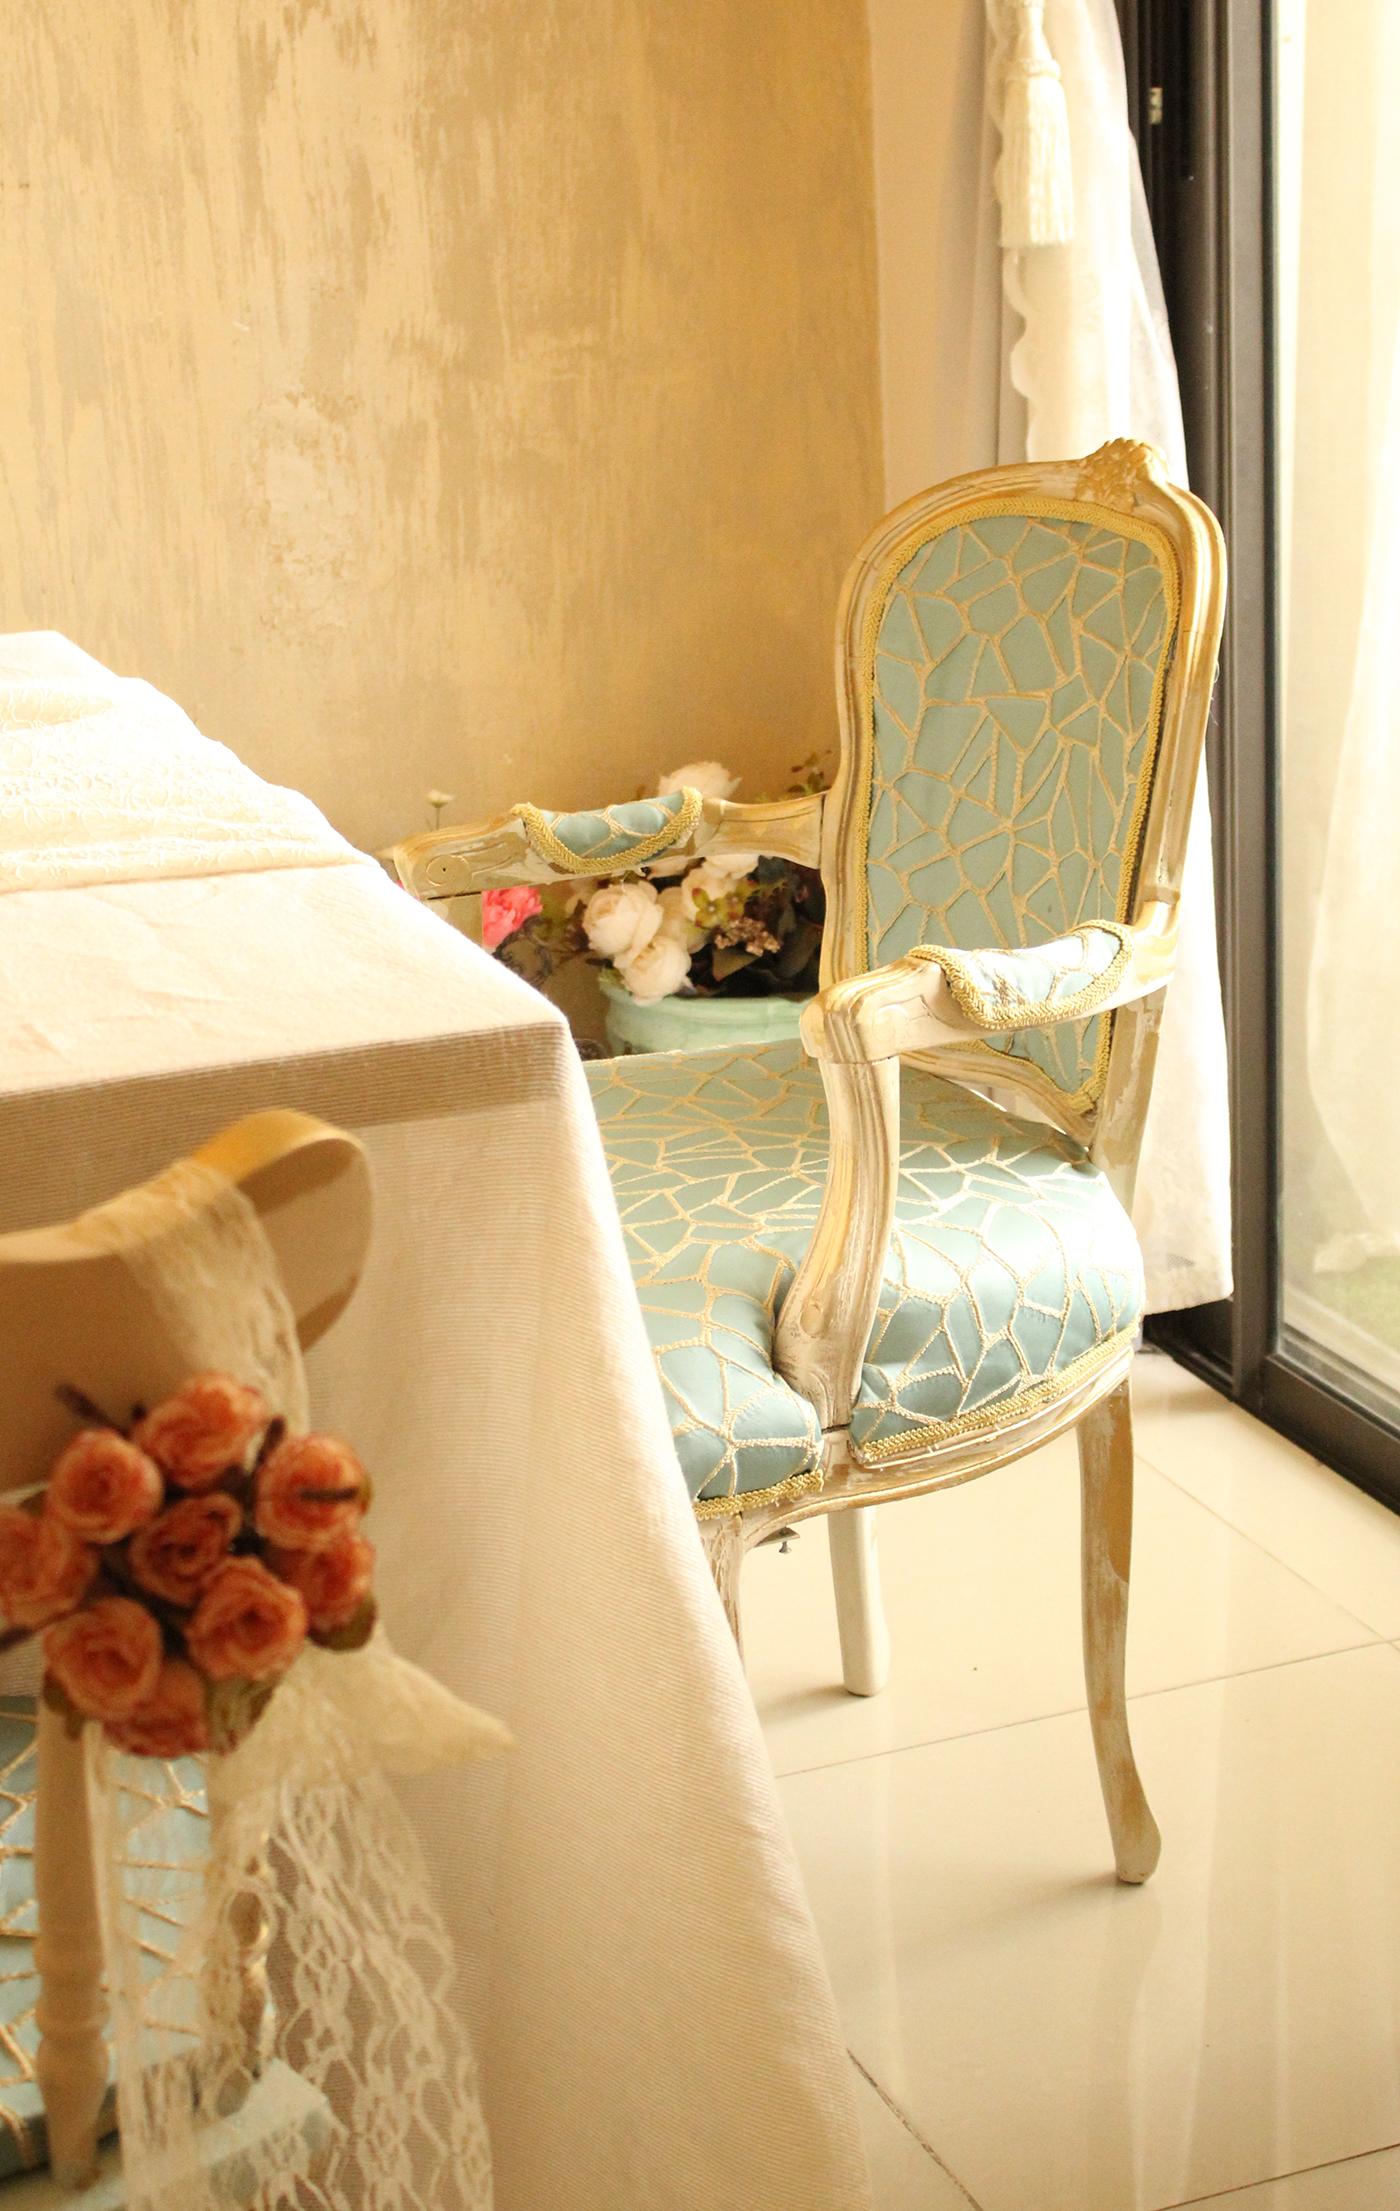 IMG 8080 - חידוש כסאות לפינת אוכל בסלון